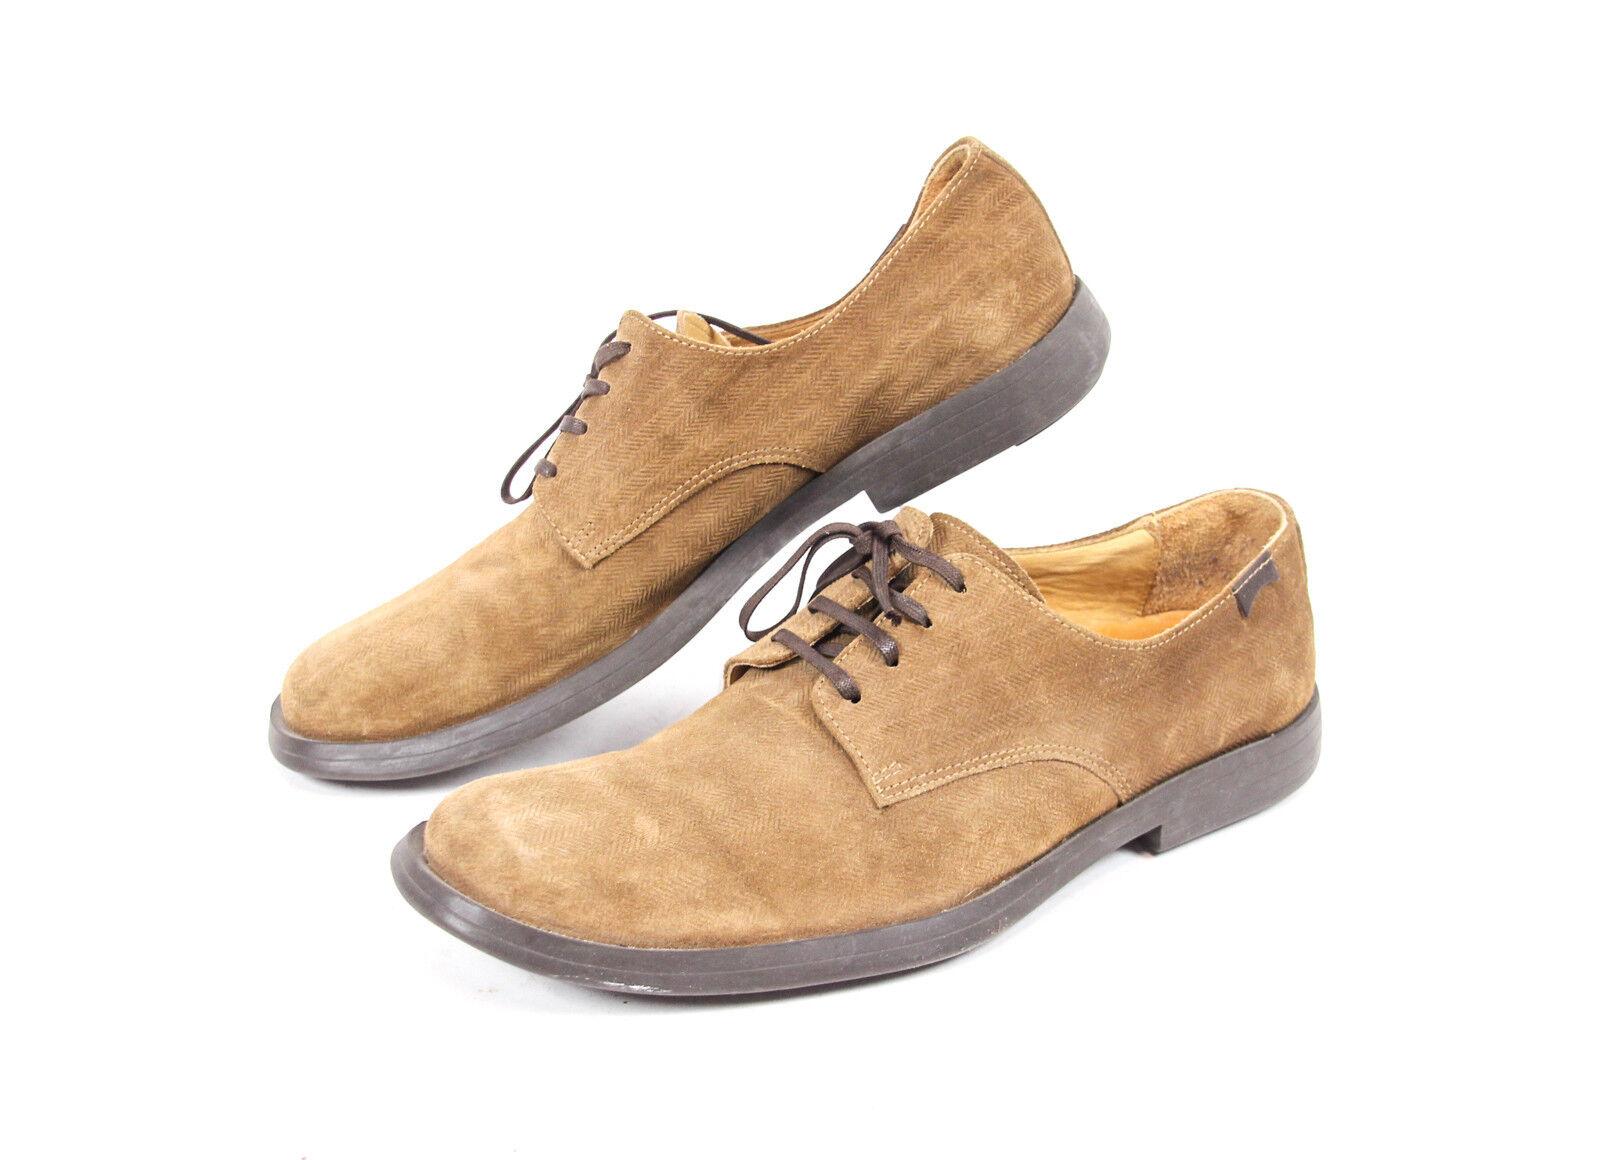 CAMPER 1910 Herren Leder Schuhe Gr 44 UK 9,5  braun Business Halbschuhe Schnürer